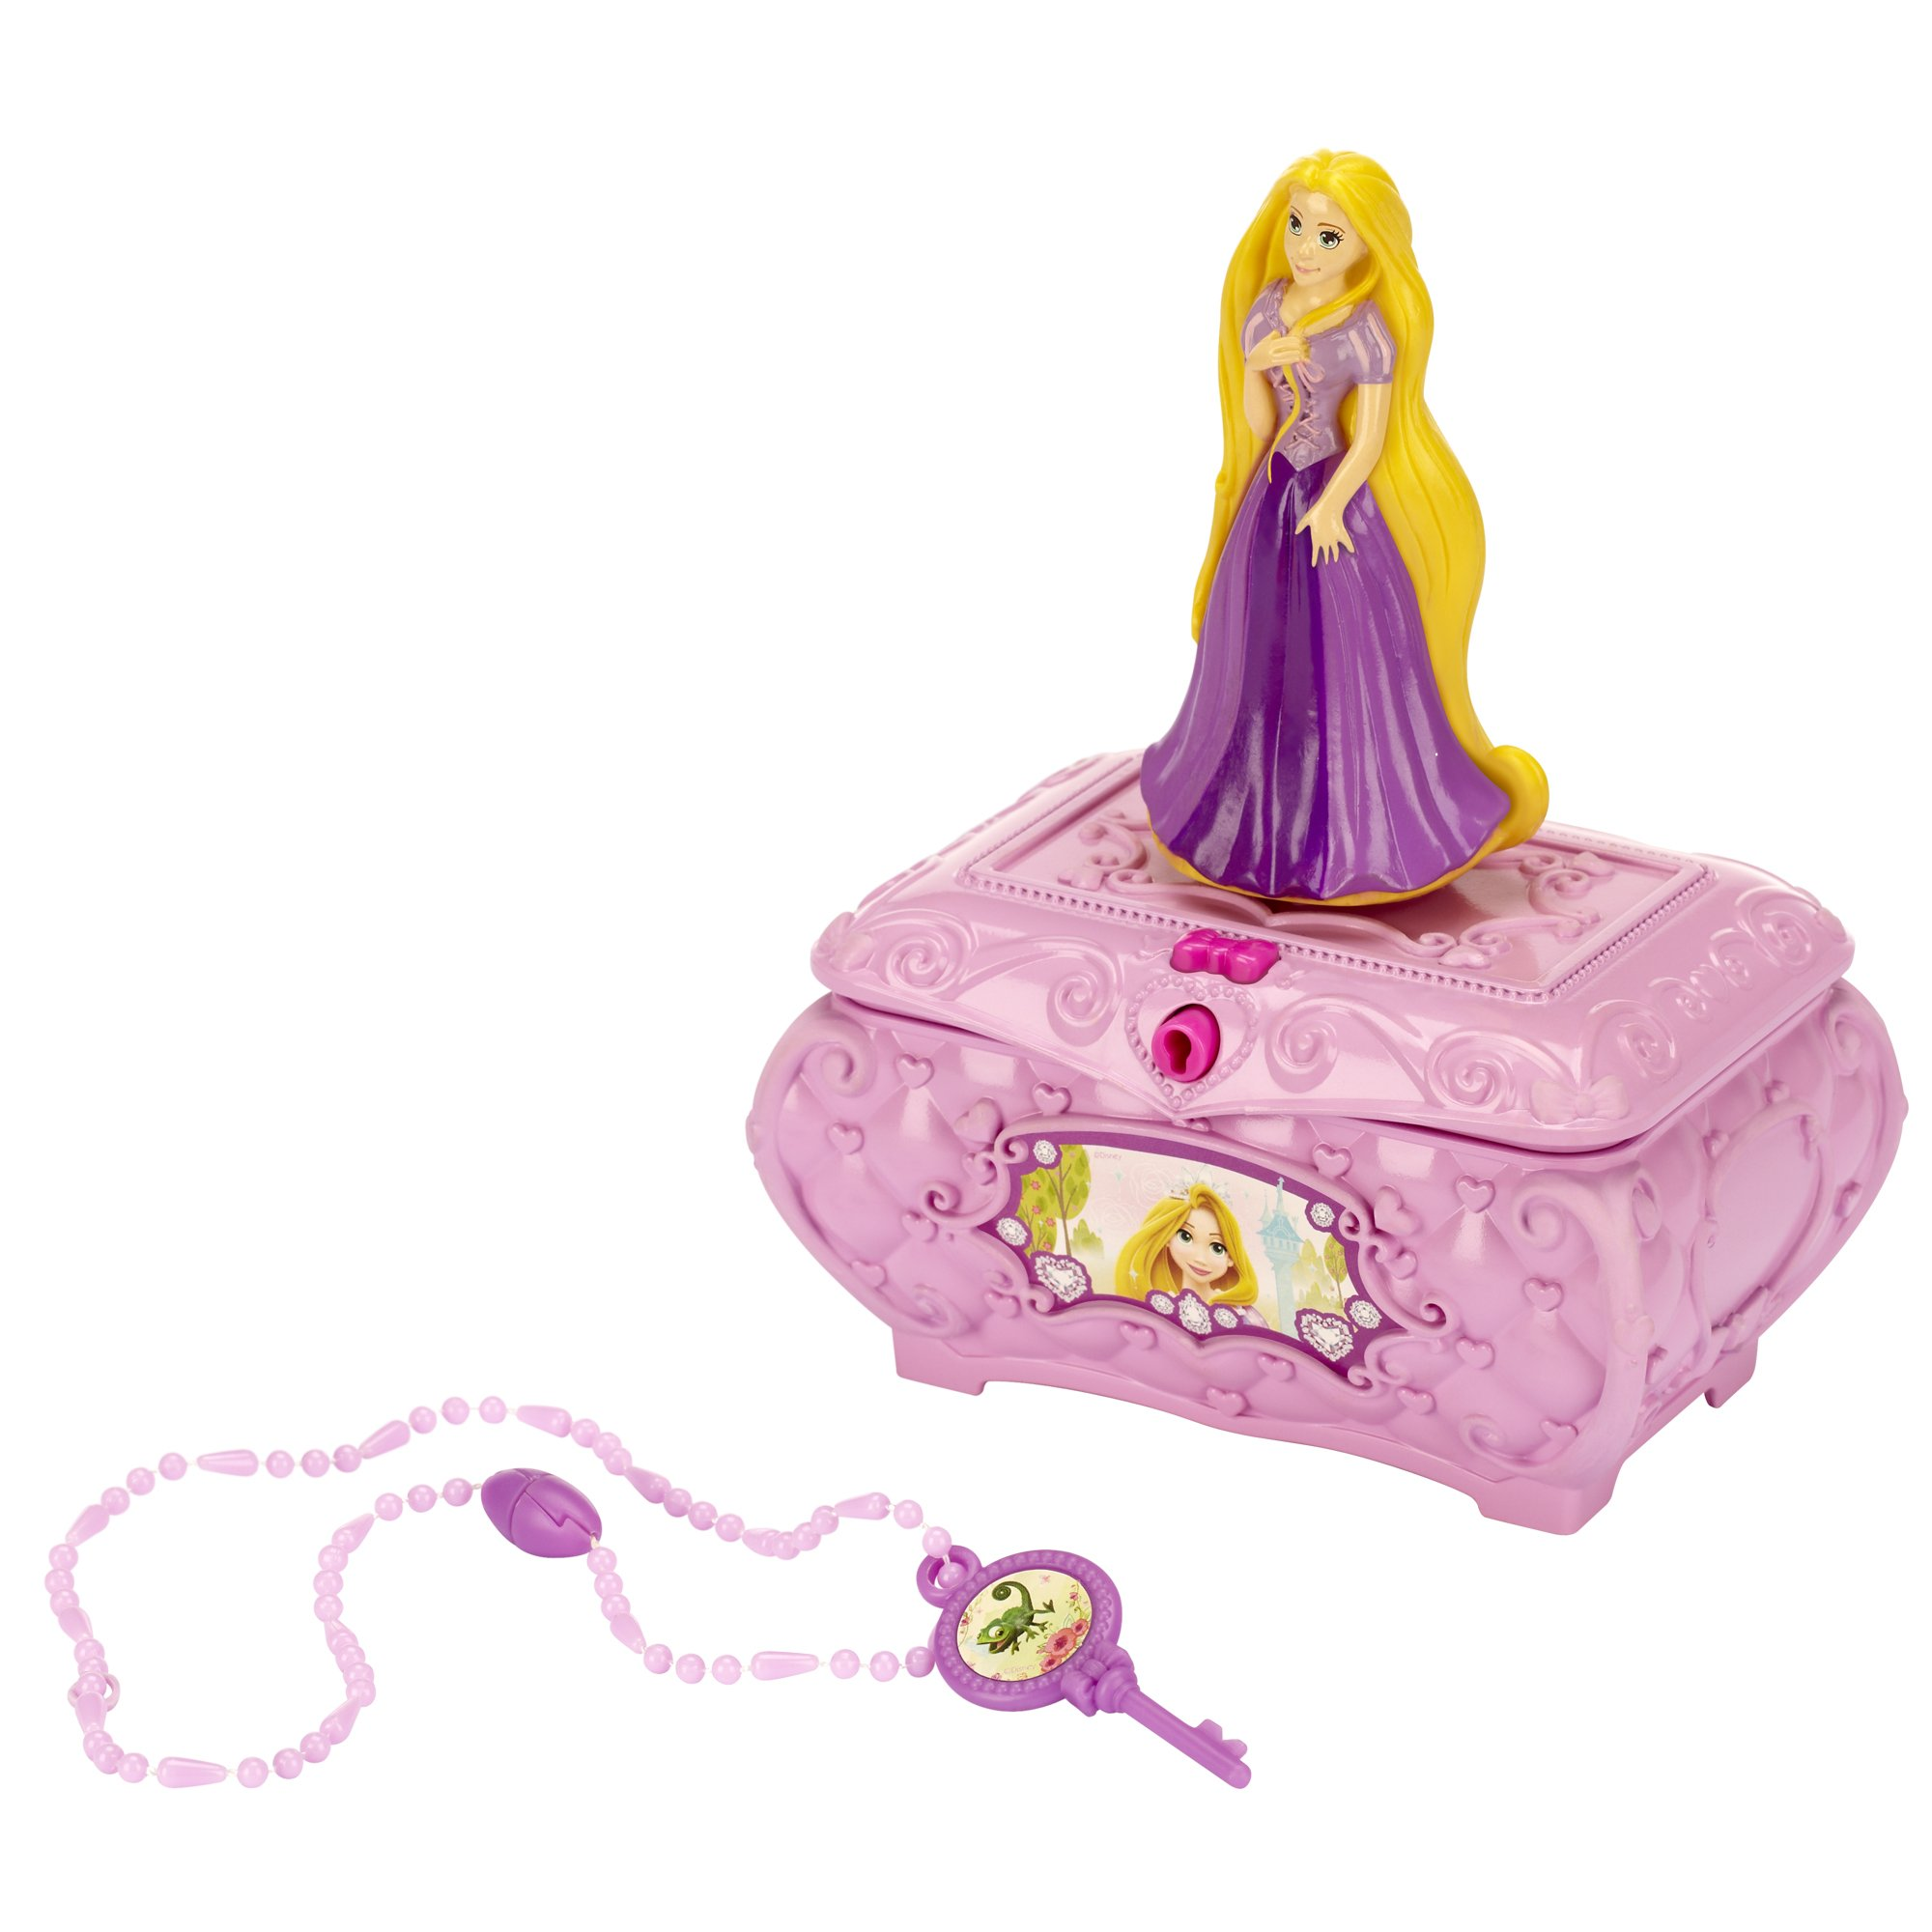 Disney Princess Rapunzel's Musical Jewelry Box